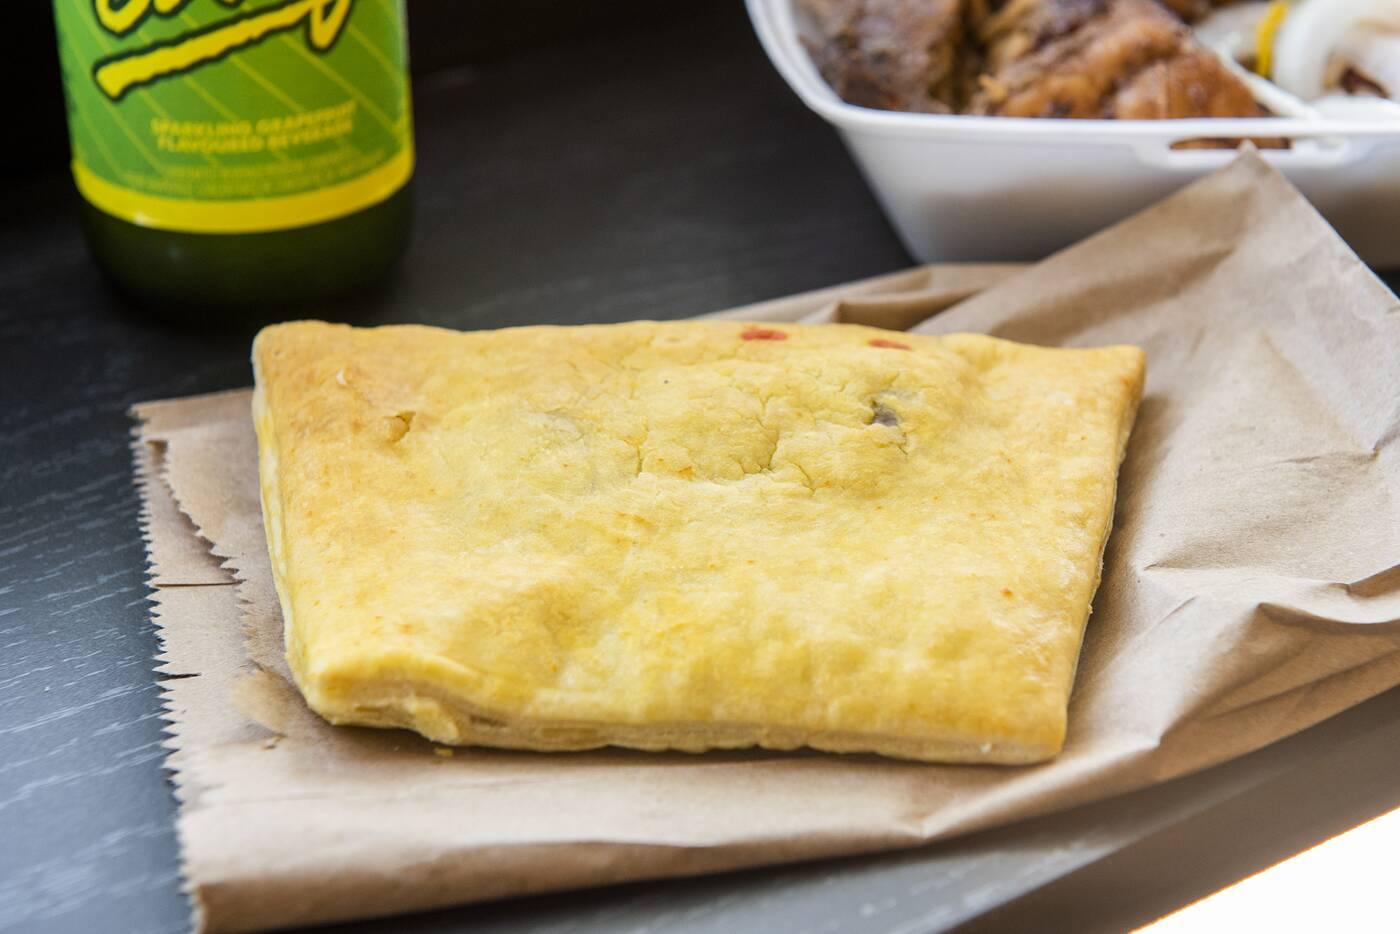 fahmee bakery toronto